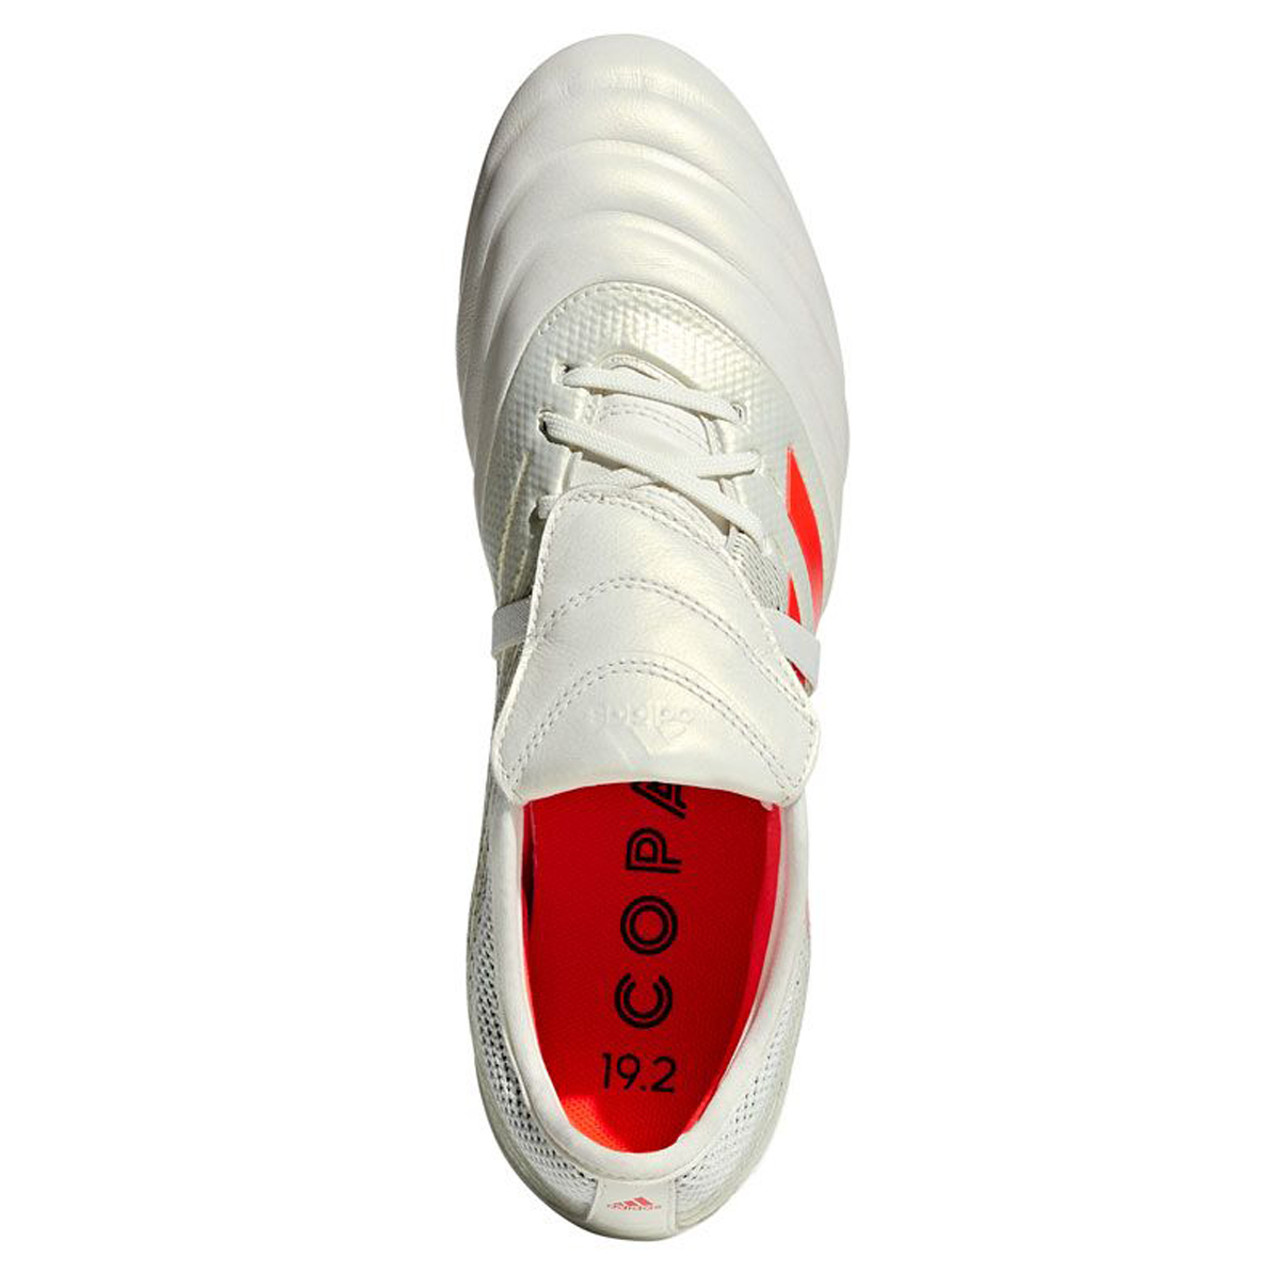 WhiteSolar Men's D98060 Red 19 2 Gloro Fg Soccer Adidas Copa Cleats rBoeCxdW